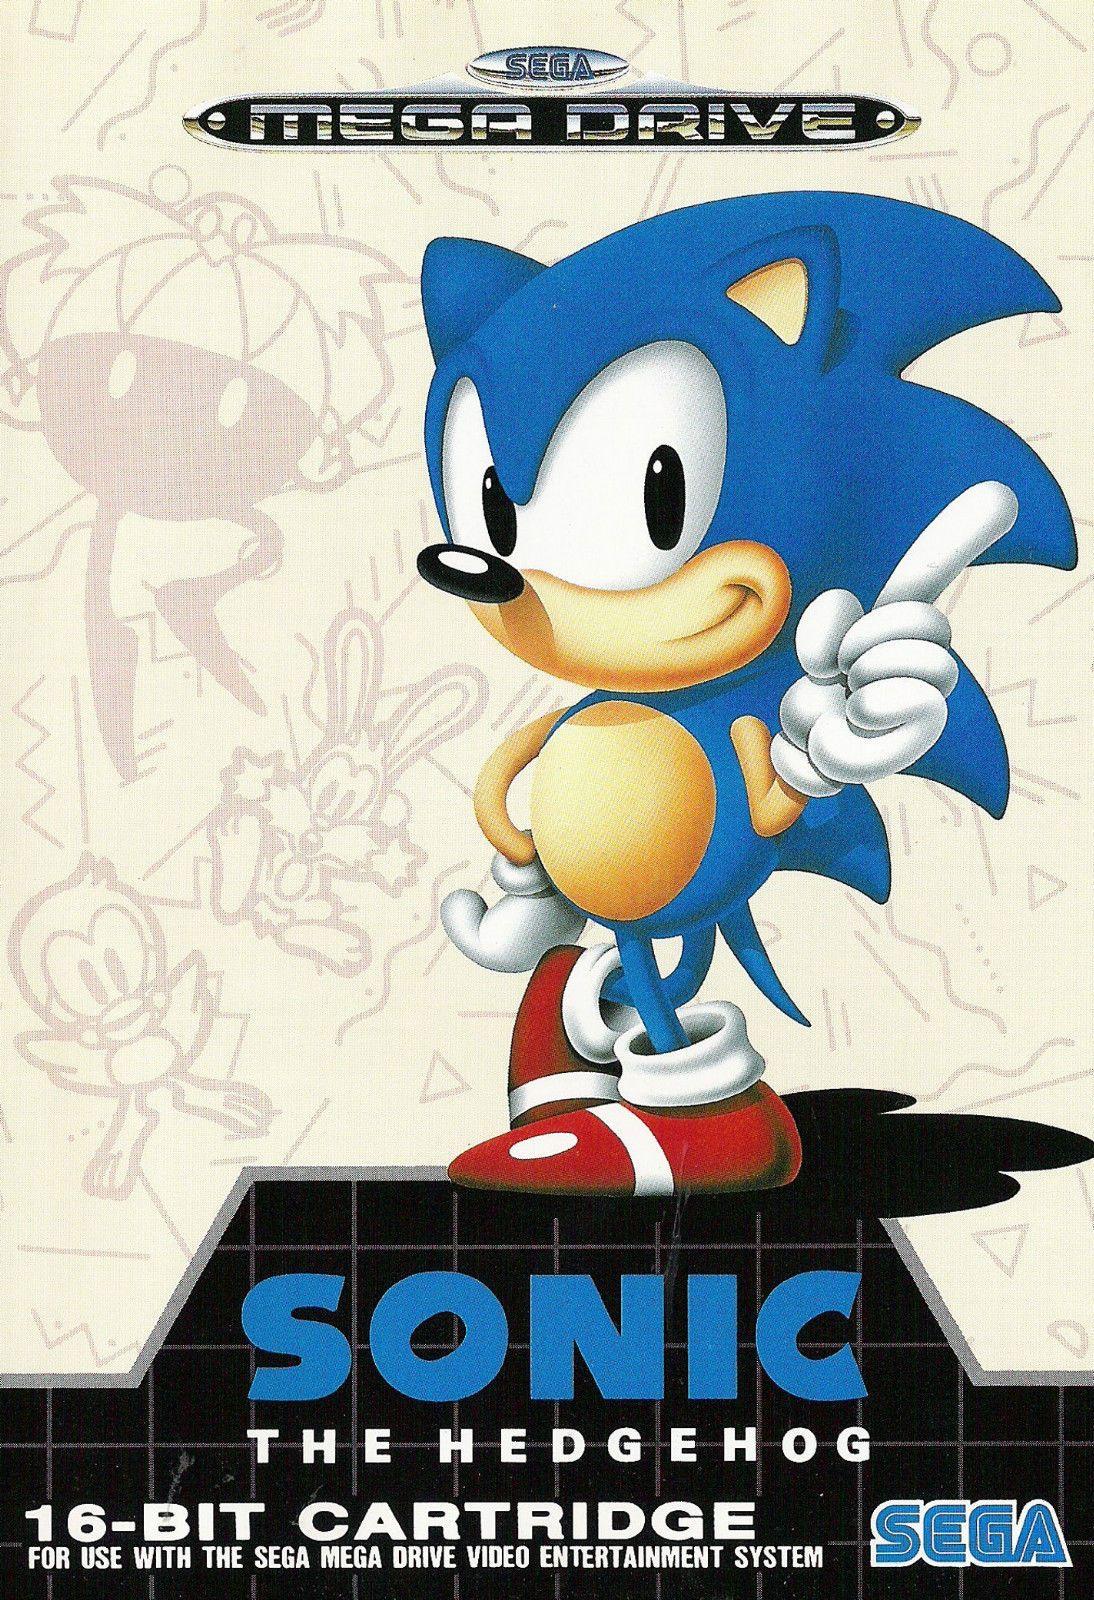 2019 Sonic The Hedgehog SEGA Mega Drive Art Silk Print Poster